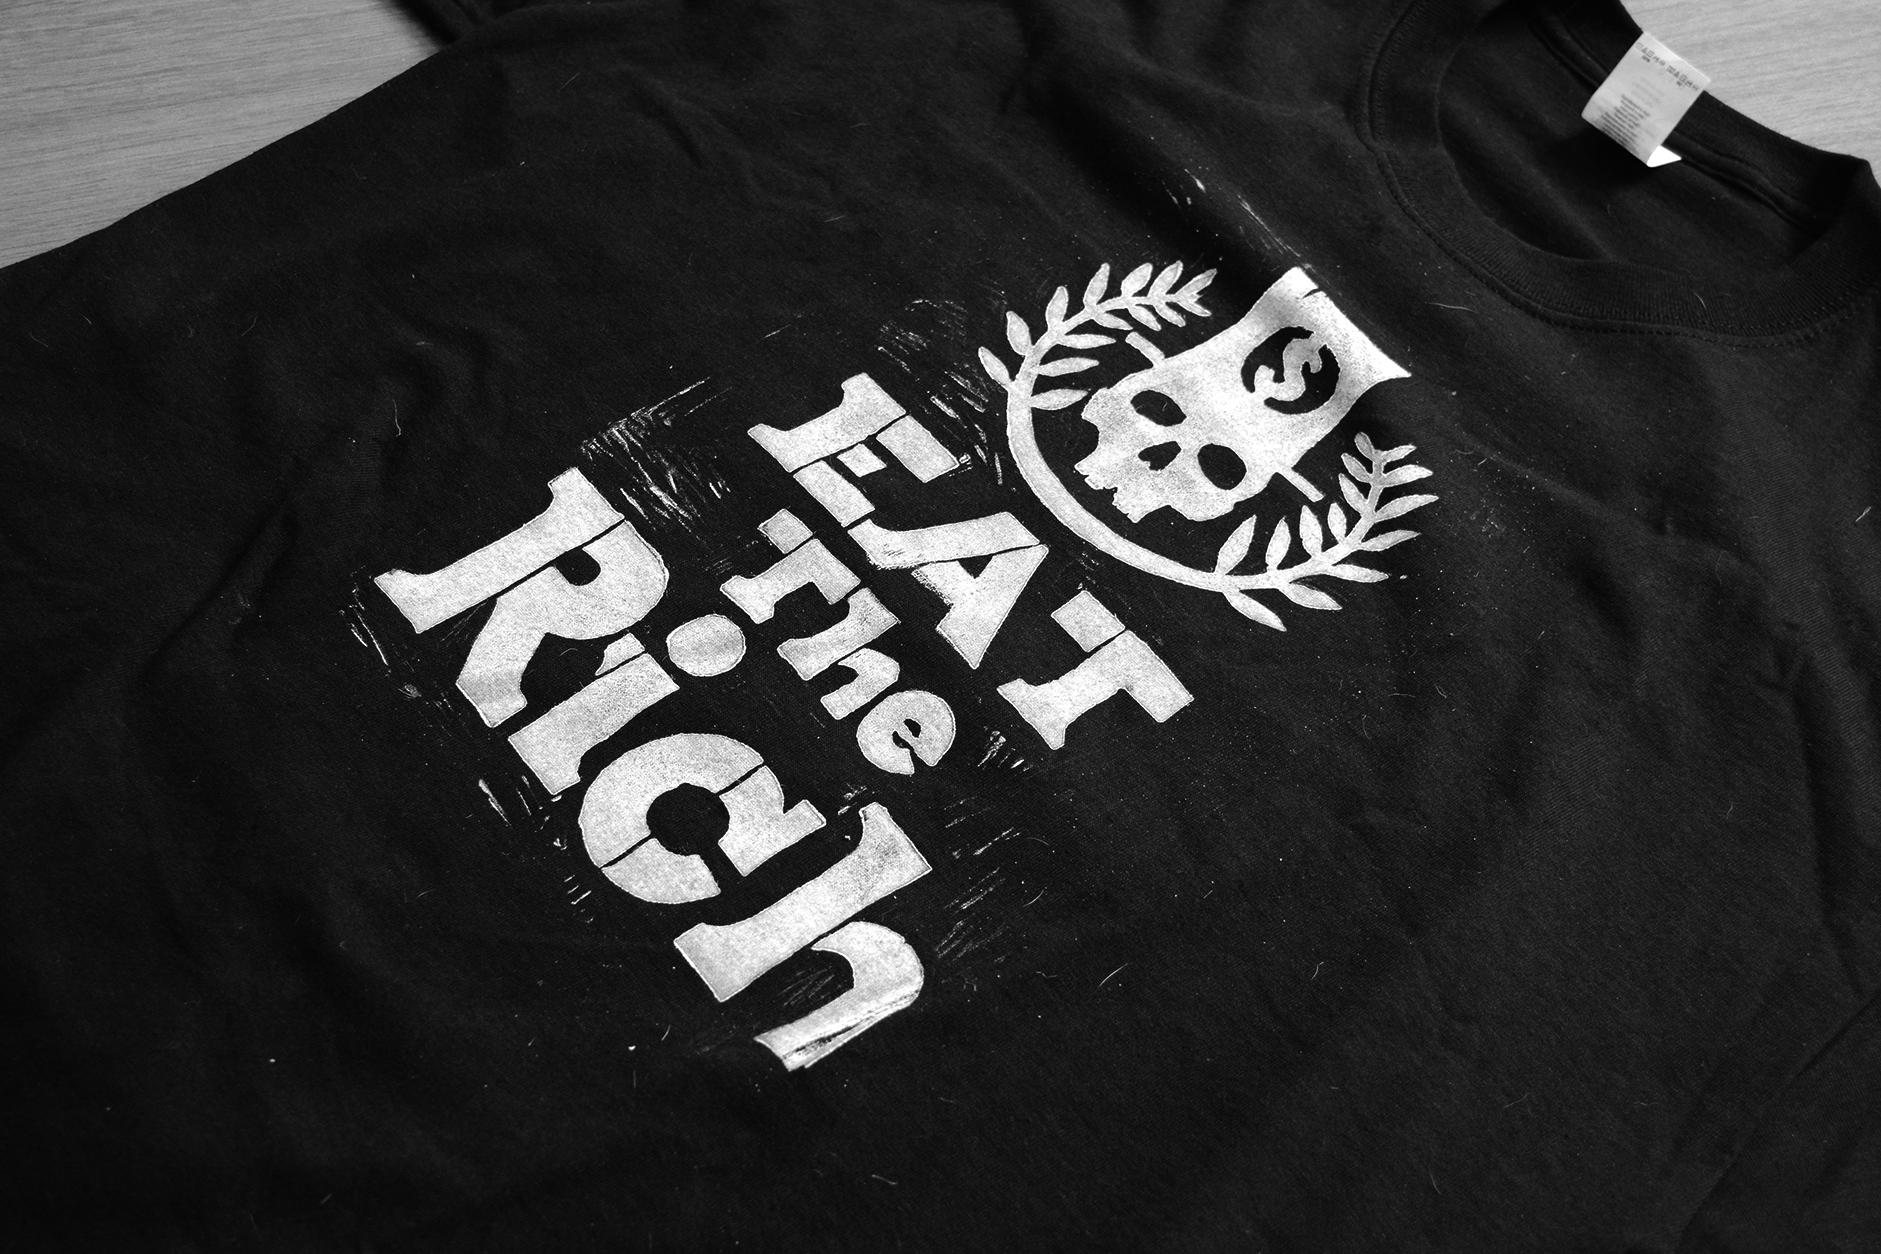 Camiseta Eat the Rich